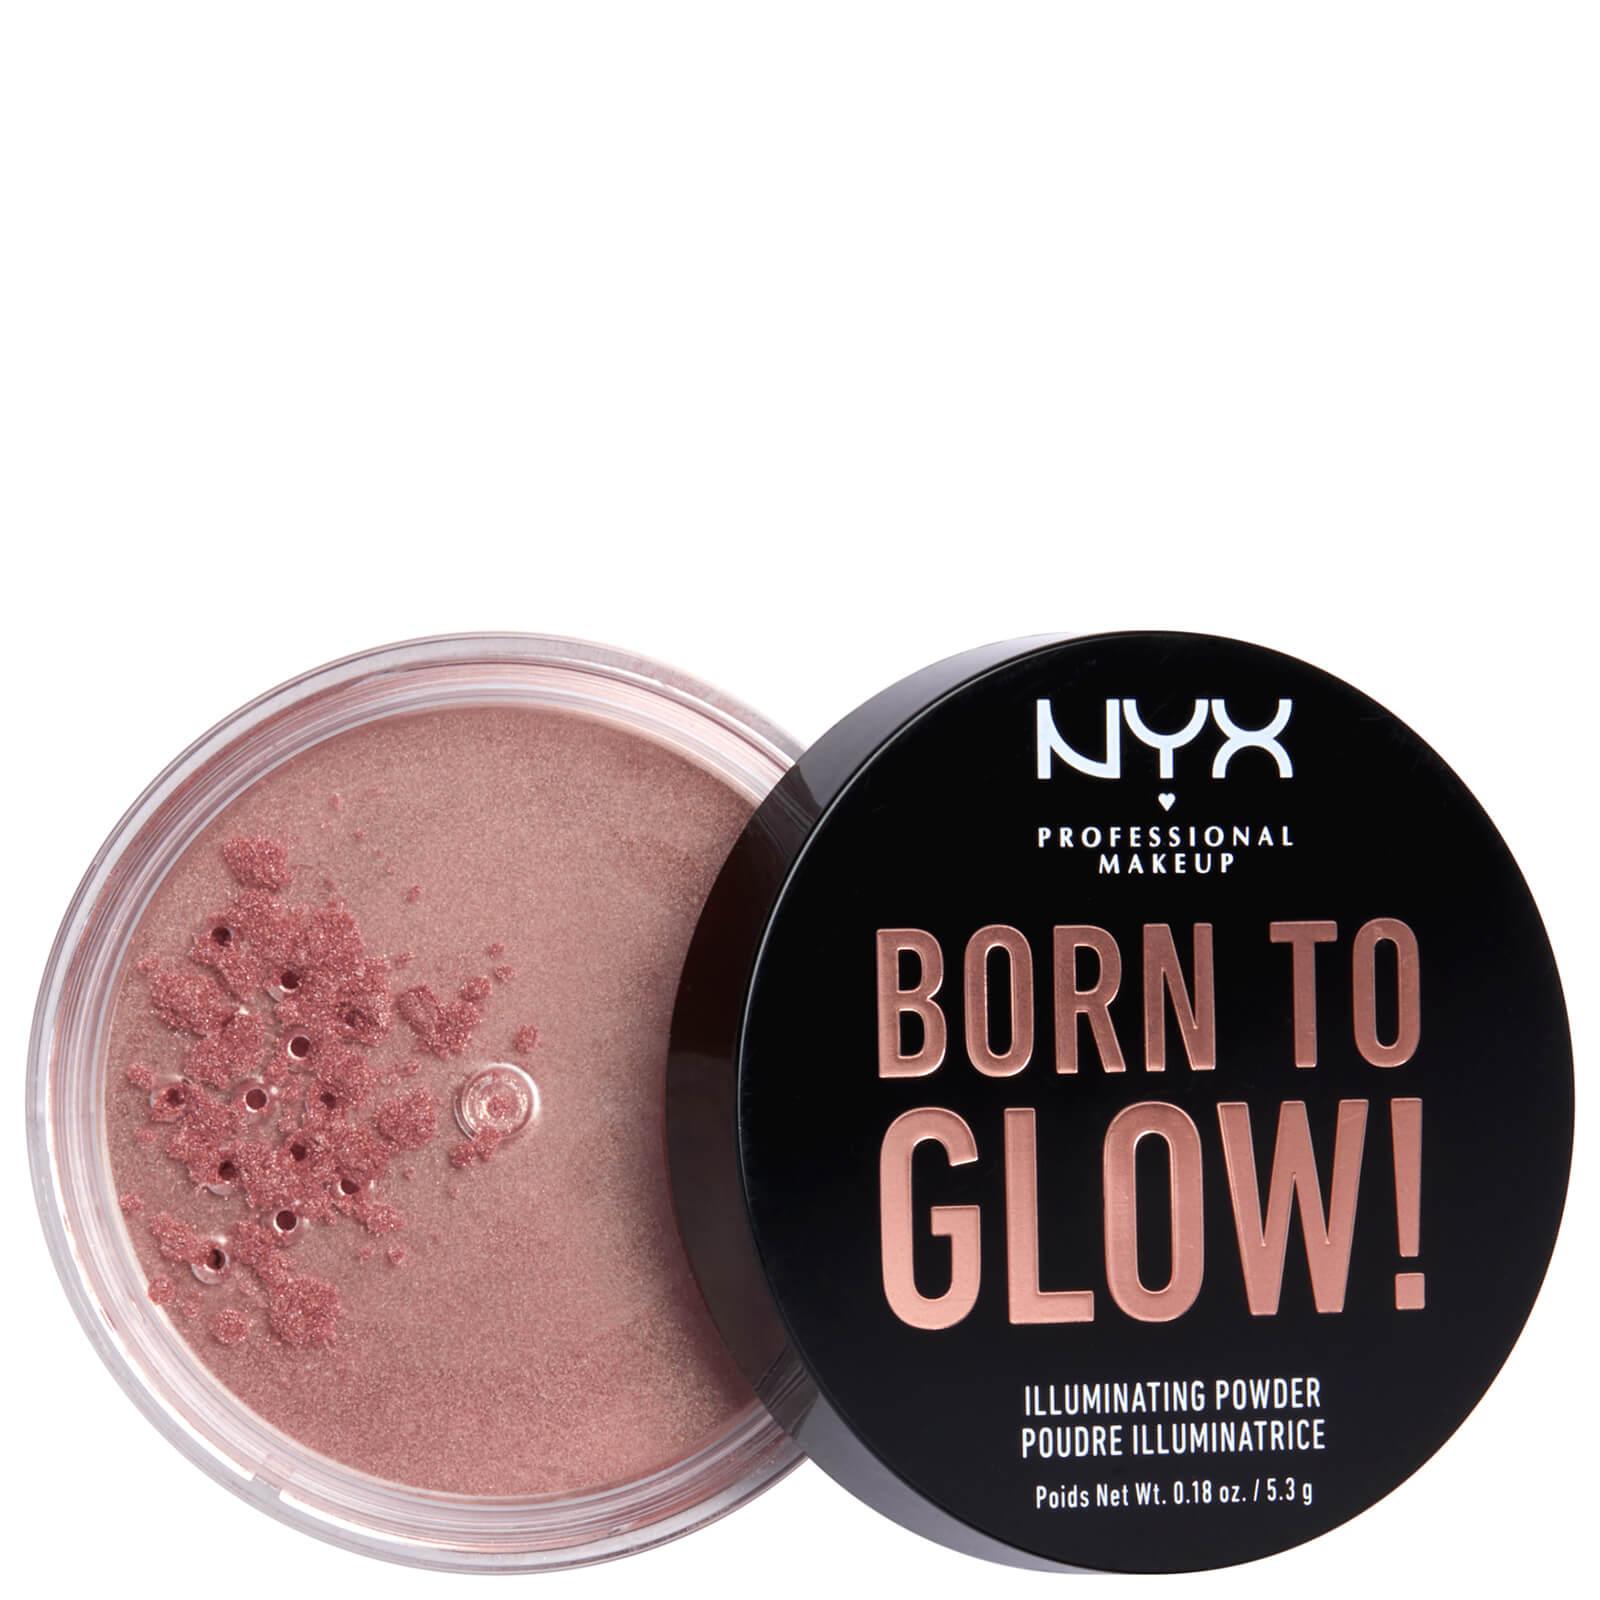 NYX Professional Makeup Born to Glow Illuminating Powder 5.3g (Various Shades) - Eternal Glow